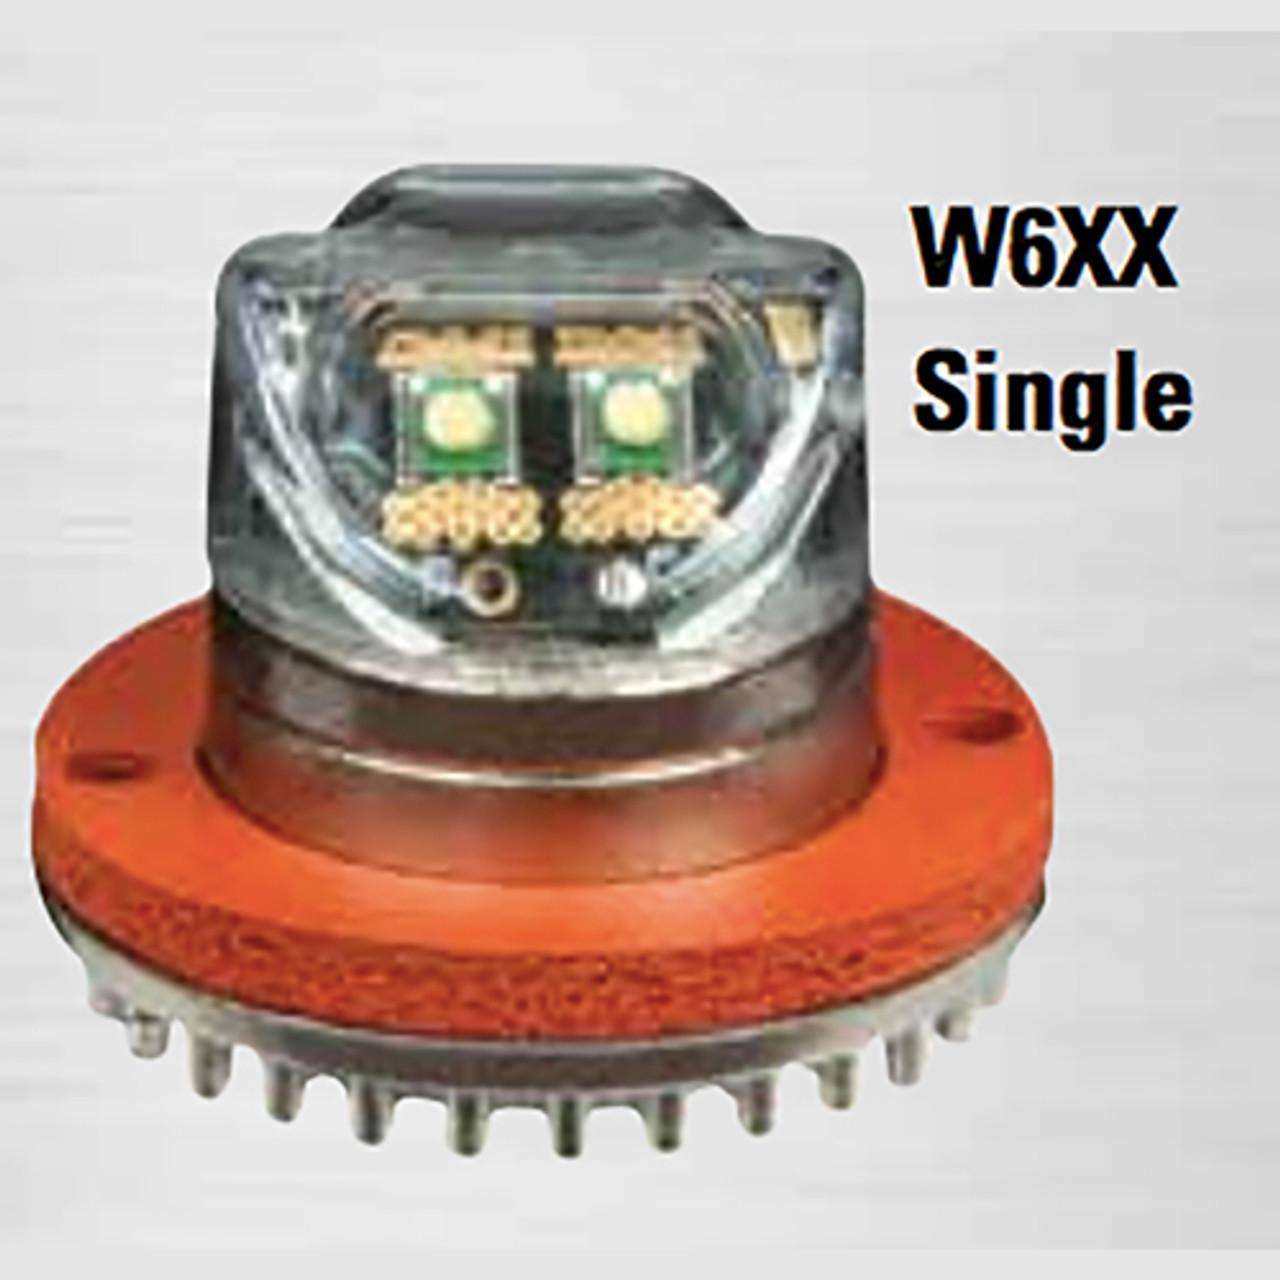 Code-3 Wildcat 4 LED Hide-A-Blast Hideaway Corner LED Light Heads, Single or Two Head